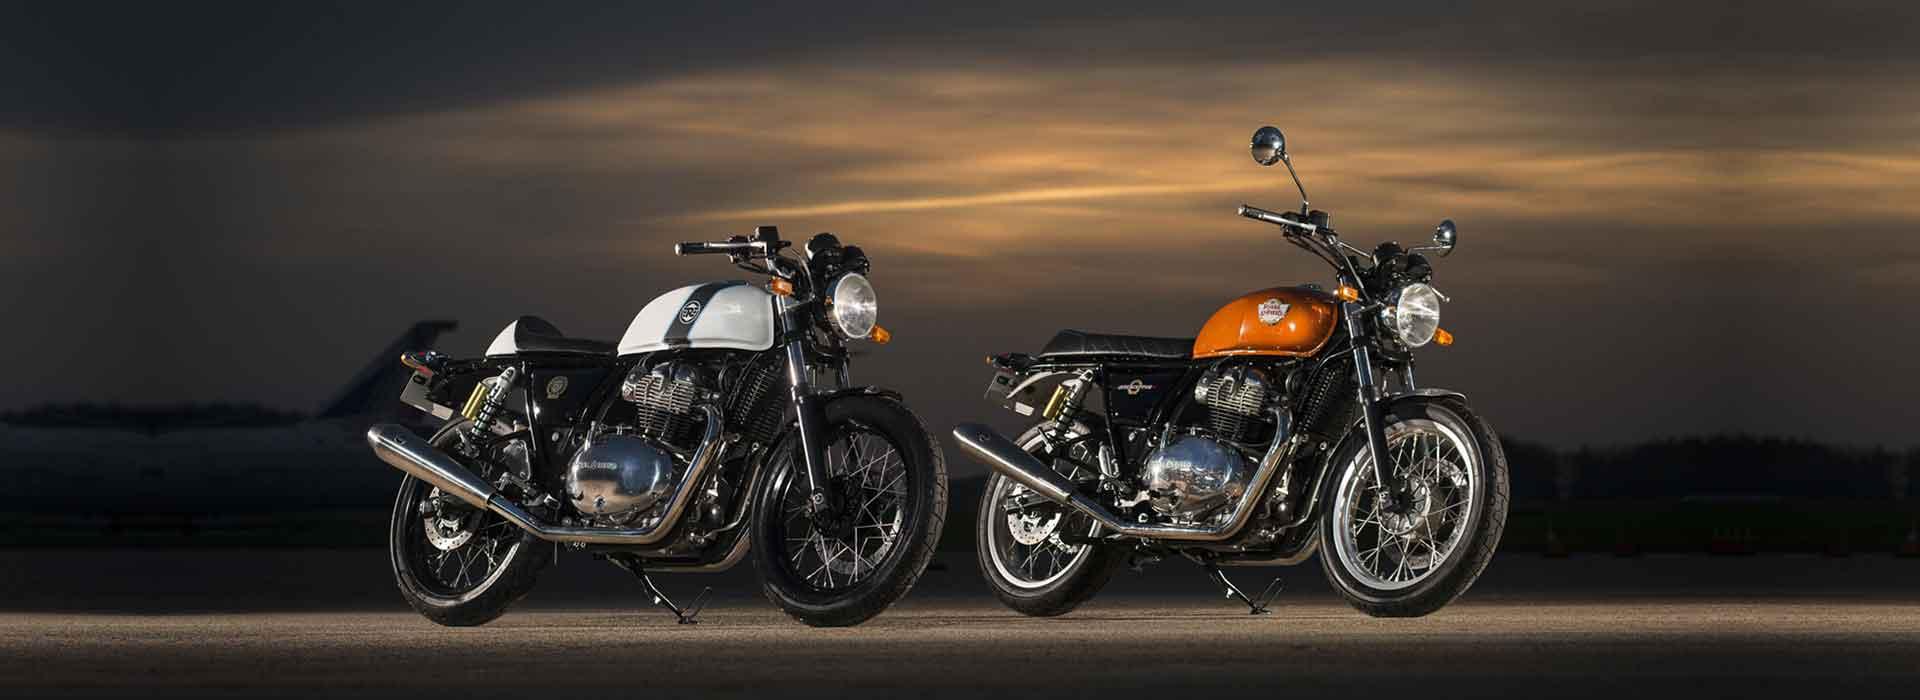 Royal Enfield - Motor Klasik Modern - Retro 2018